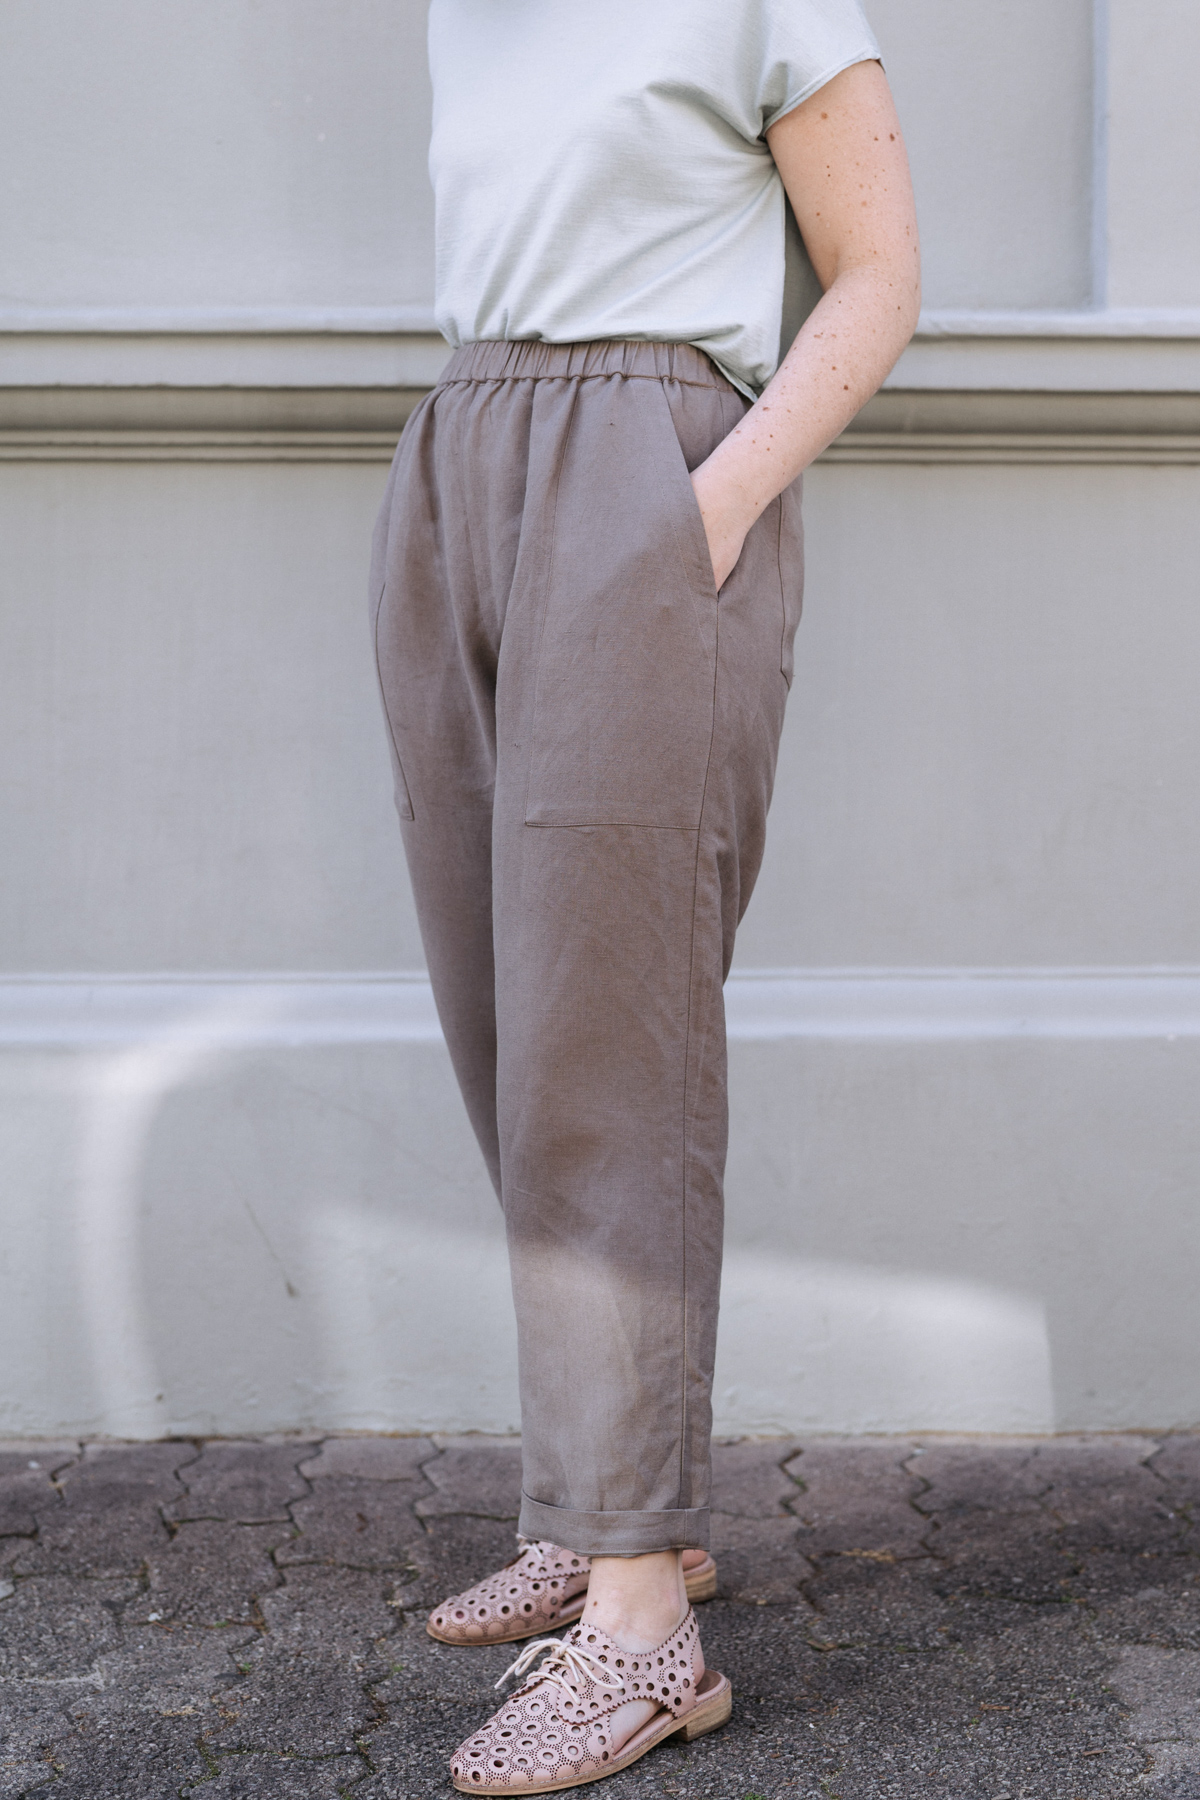 Detail on Megan Nielsen's Extended Pocket Opal Pants